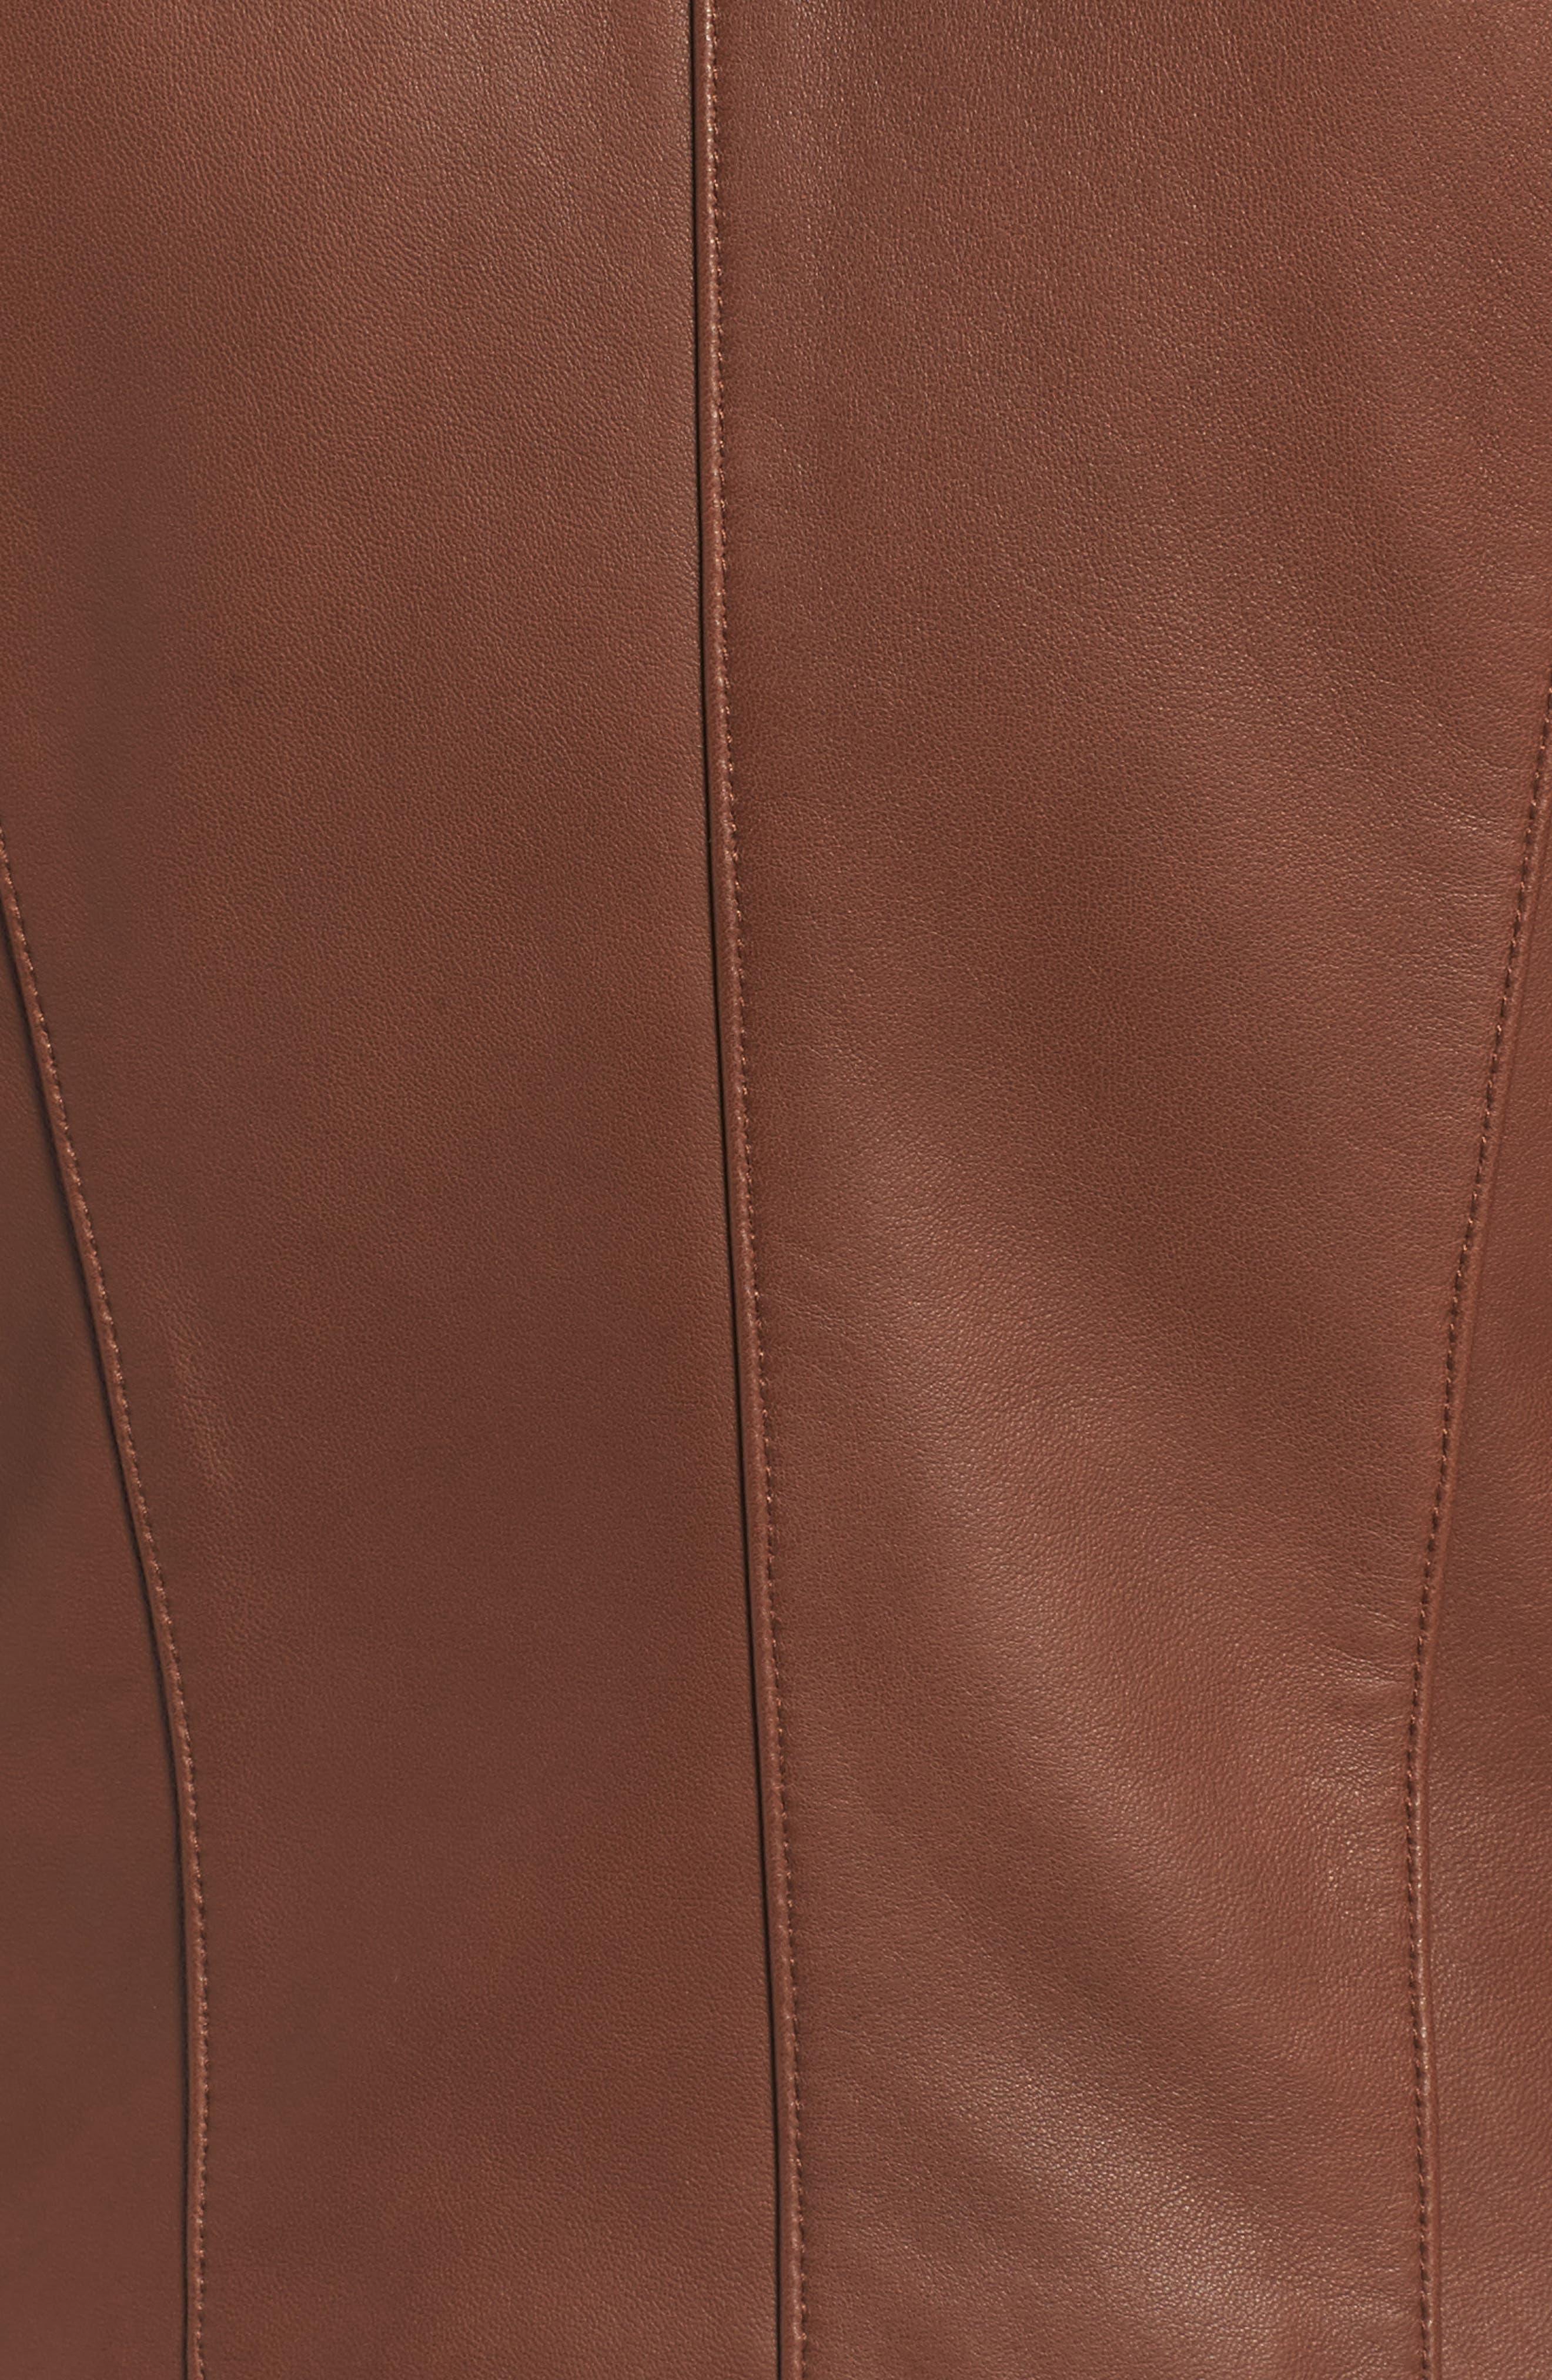 Leather Moto Jacket,                             Alternate thumbnail 5, color,                             Chestnut